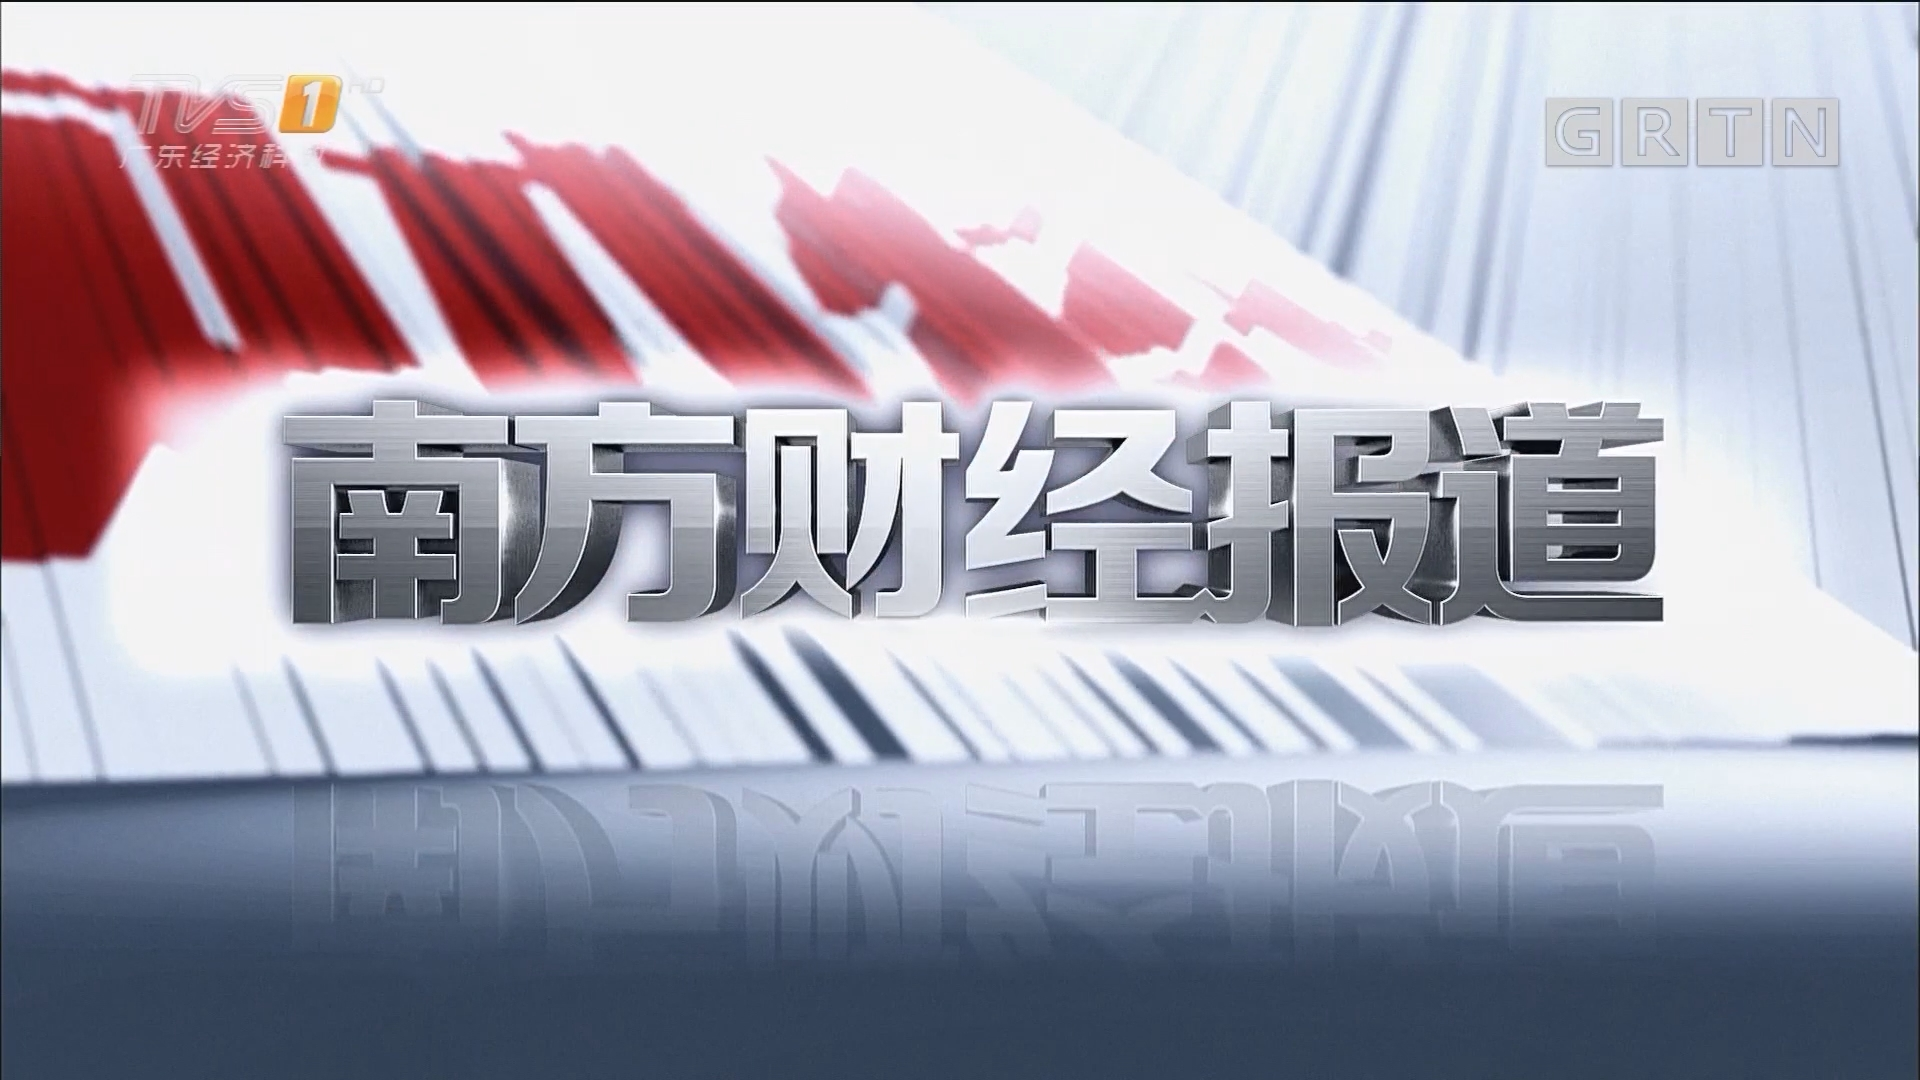 [HD][2018-02-28]南方财经报道:全国人大常委会五年立法规划完成逾七成